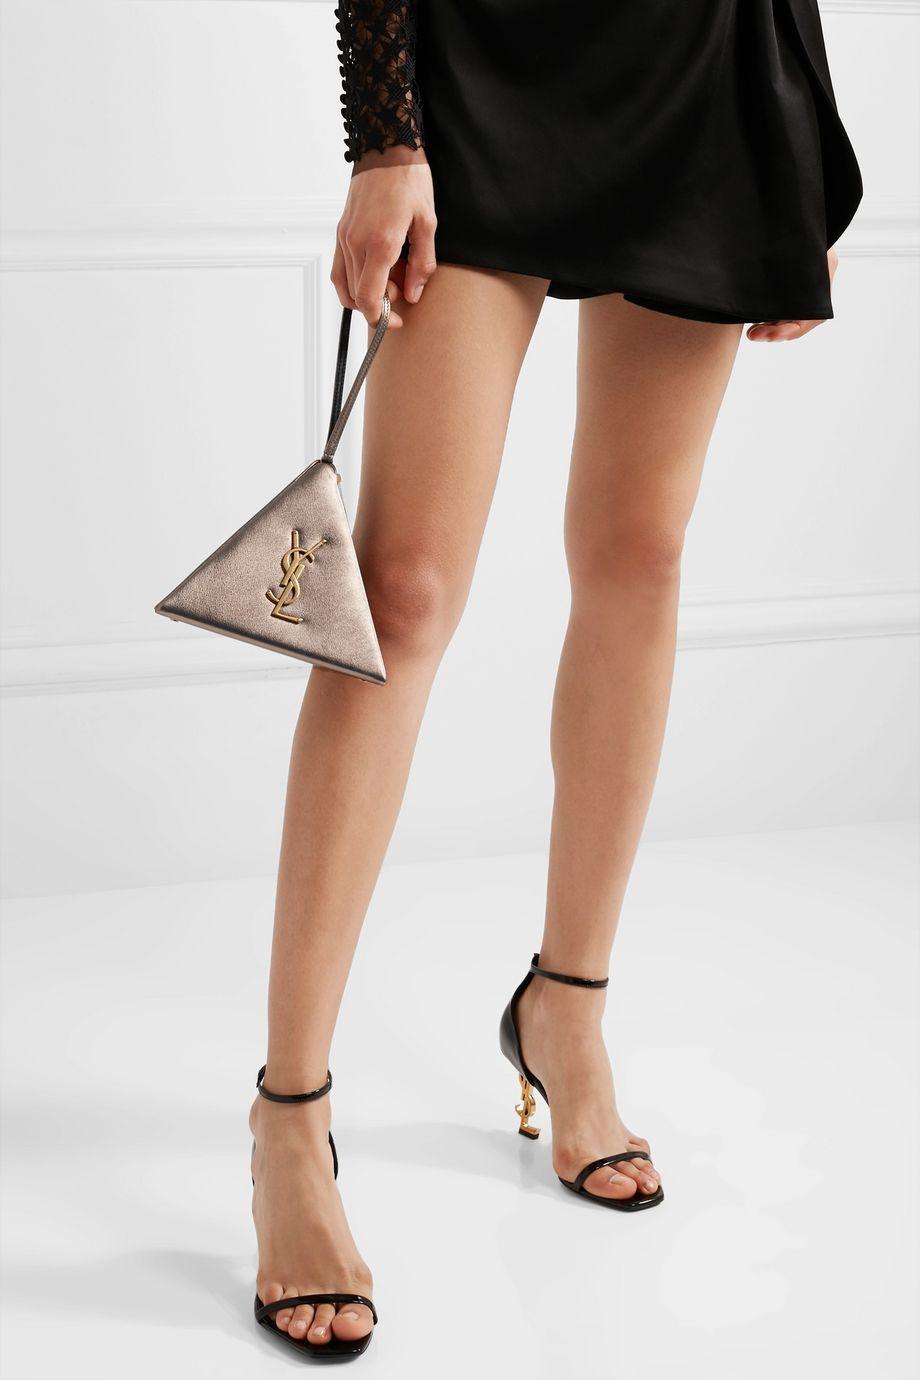 SAINT LAURENT Pyramid metallic leather clutch